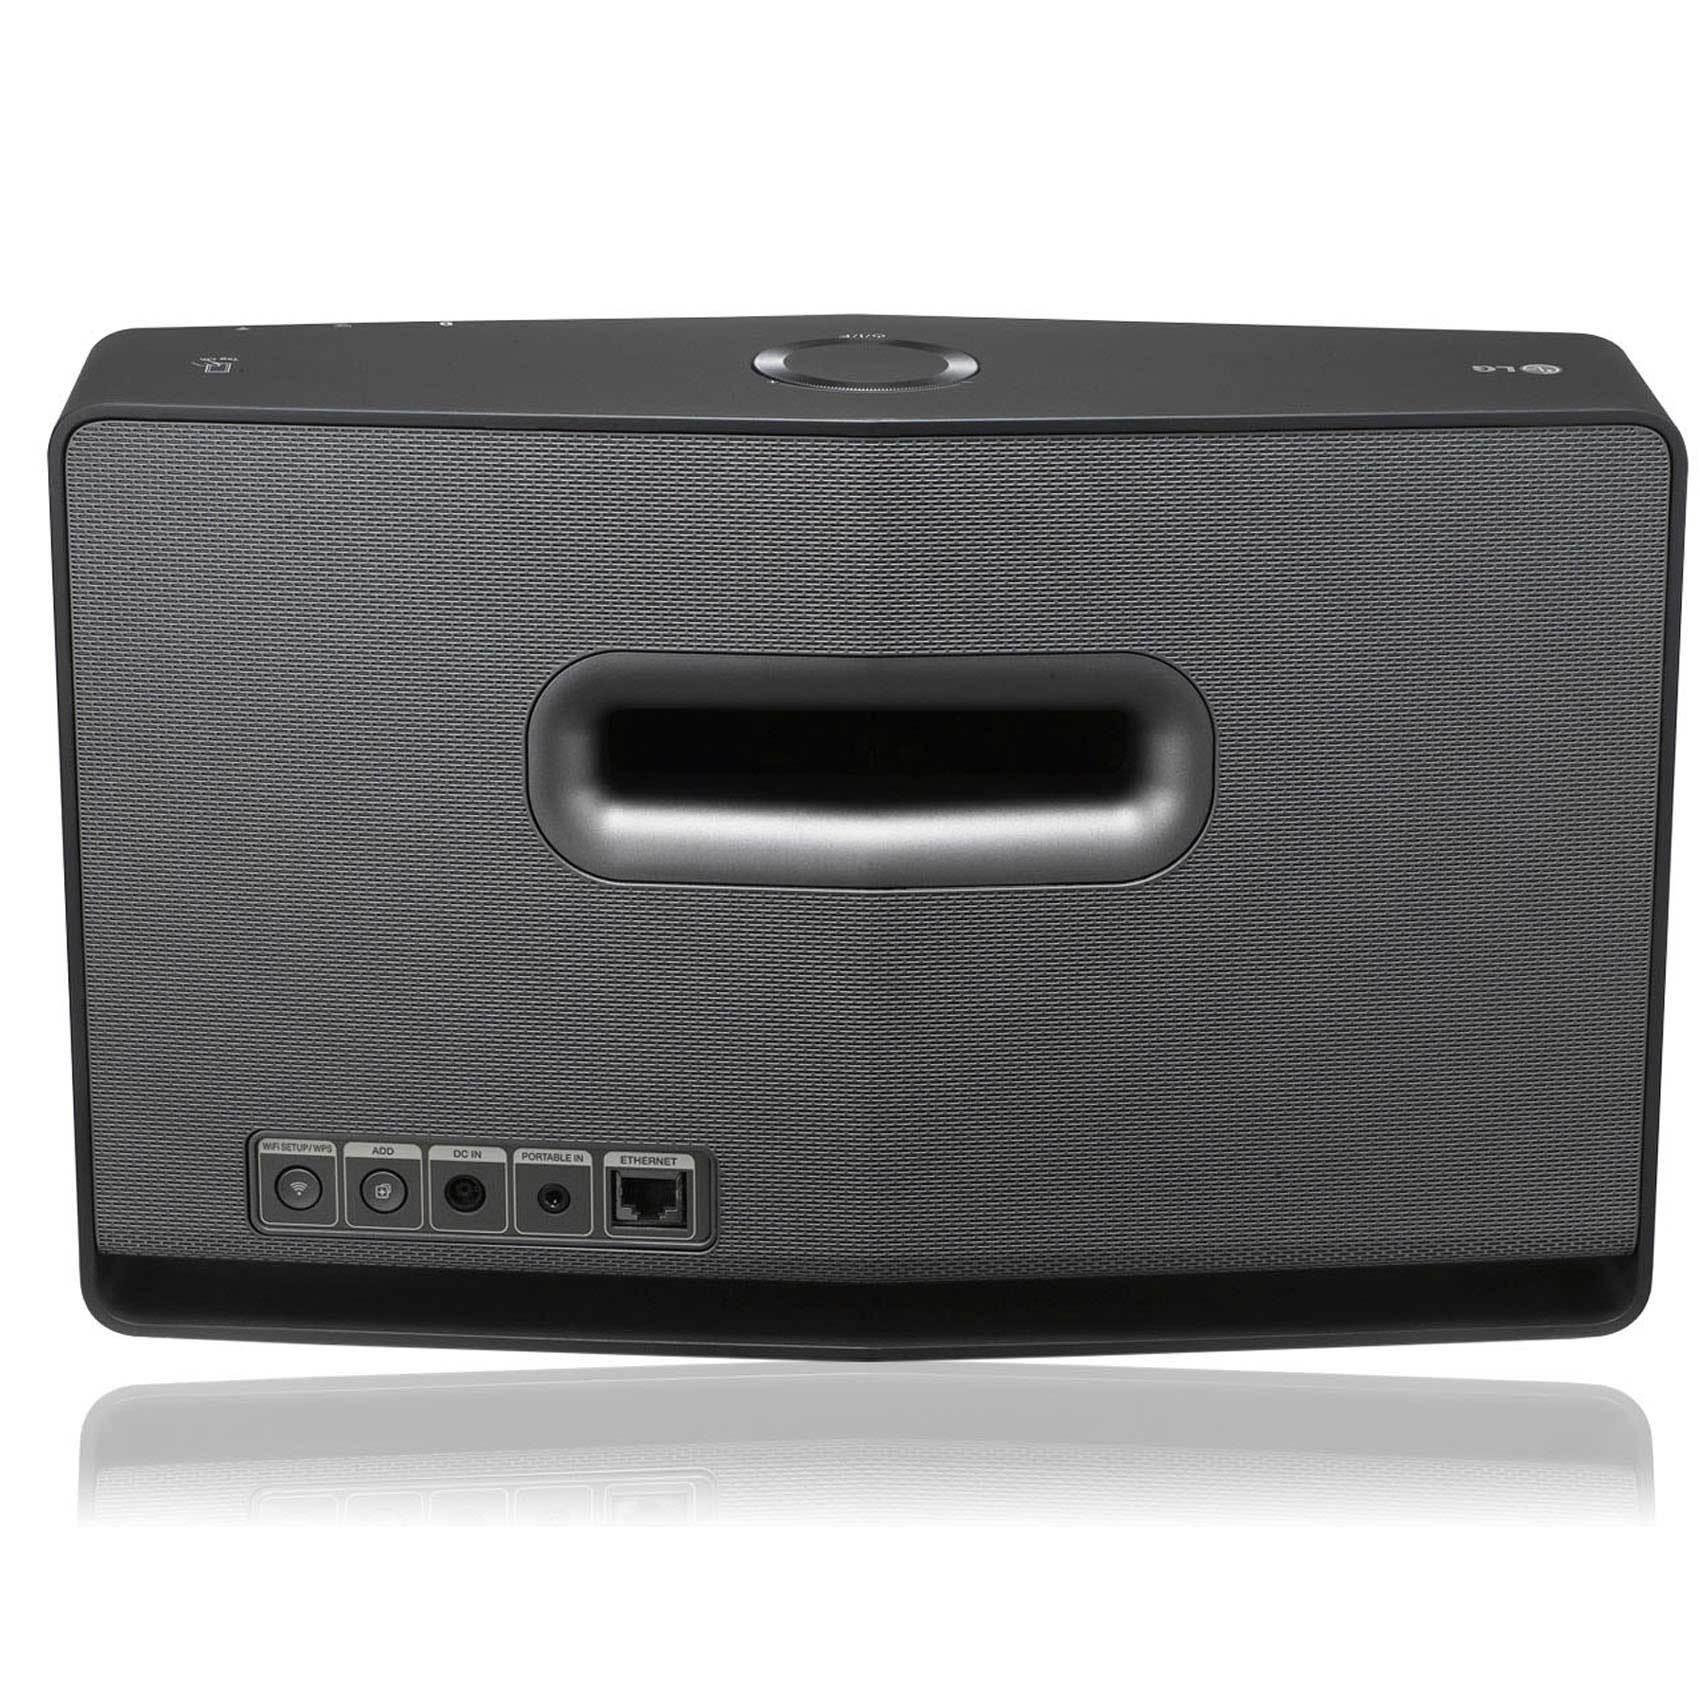 LG MP3 SPEAKER NP8740 H7